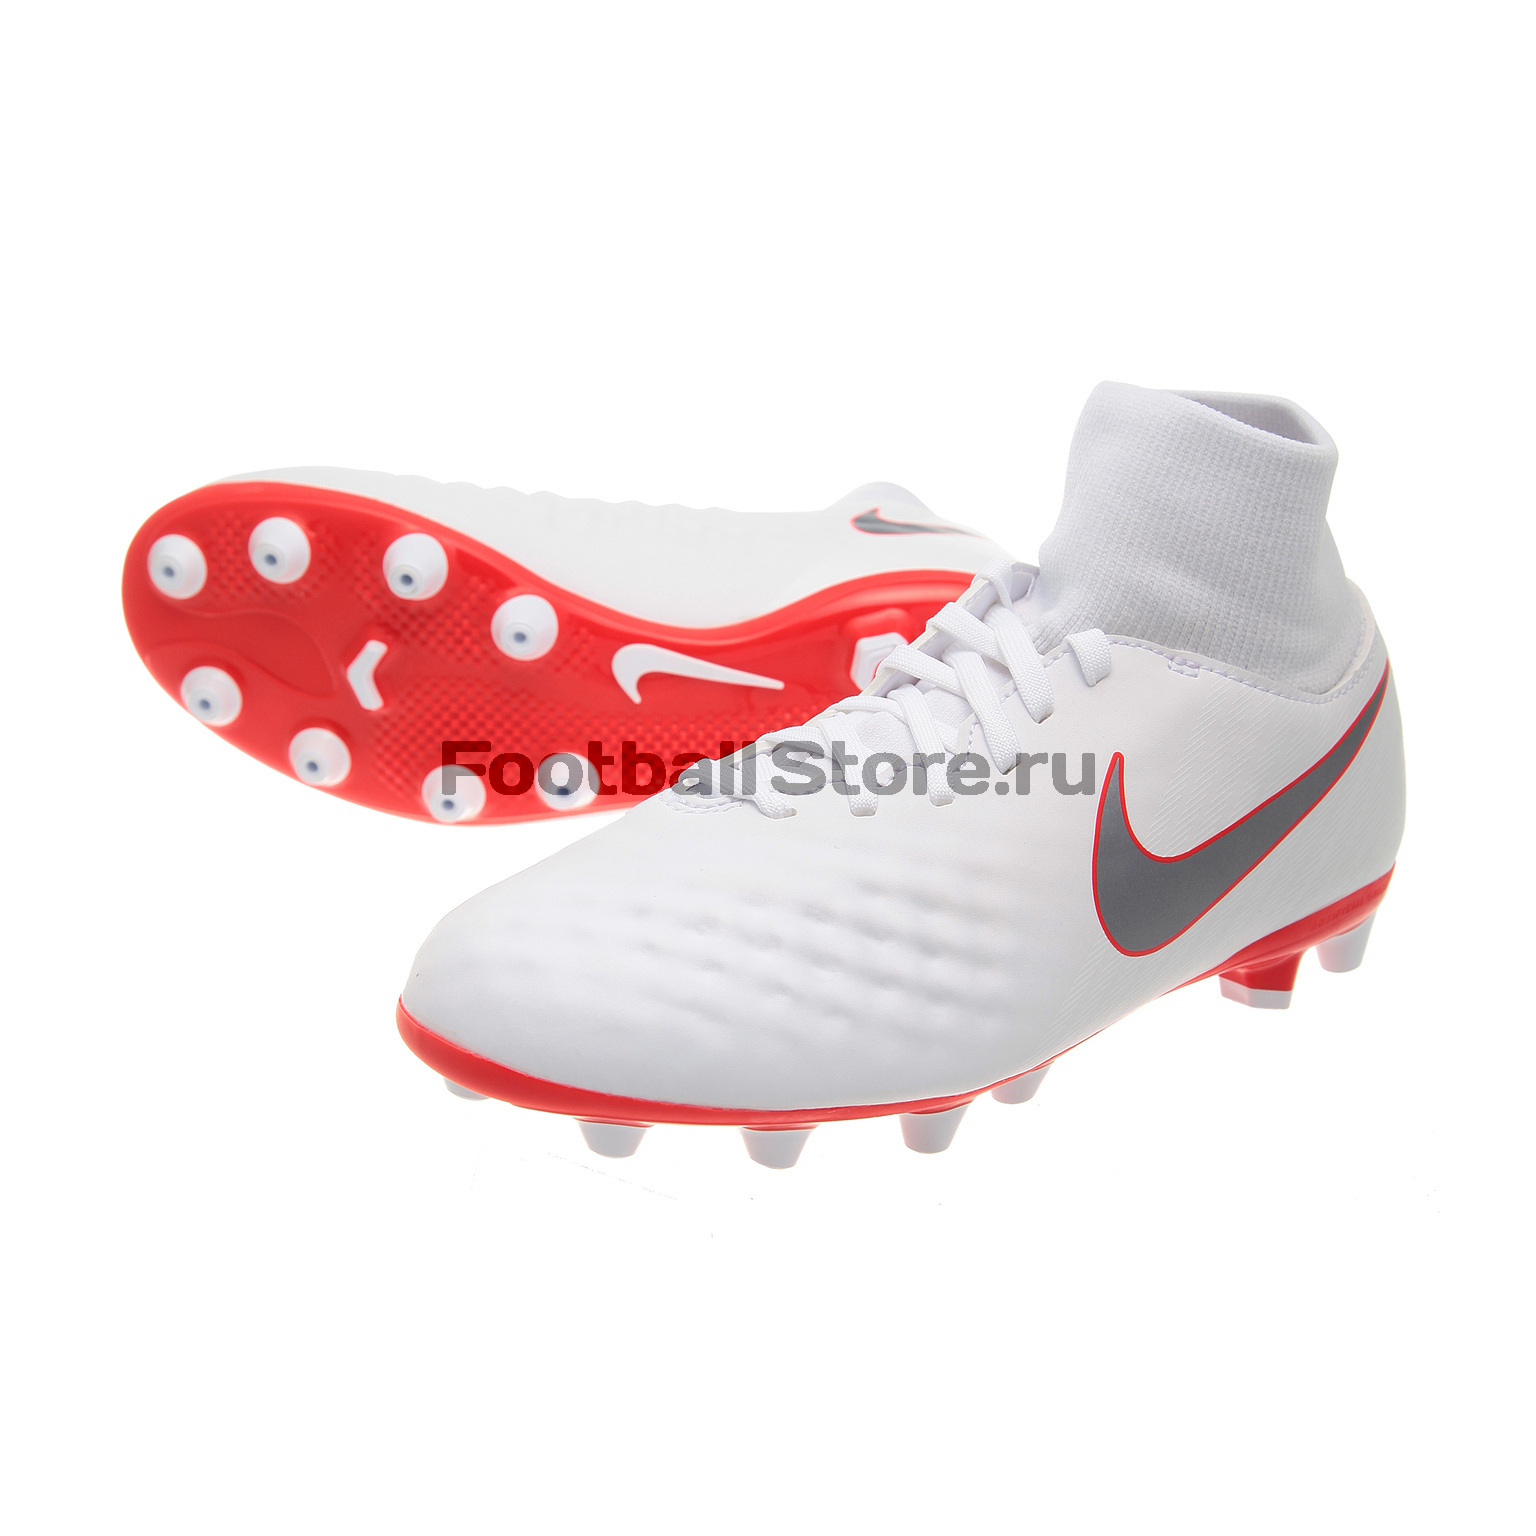 Бутсы детские Nike Obra 2 Academy DF AG-Pro AO4556-107 бутсы детские nike phantom vision academy df sg aq9298 400